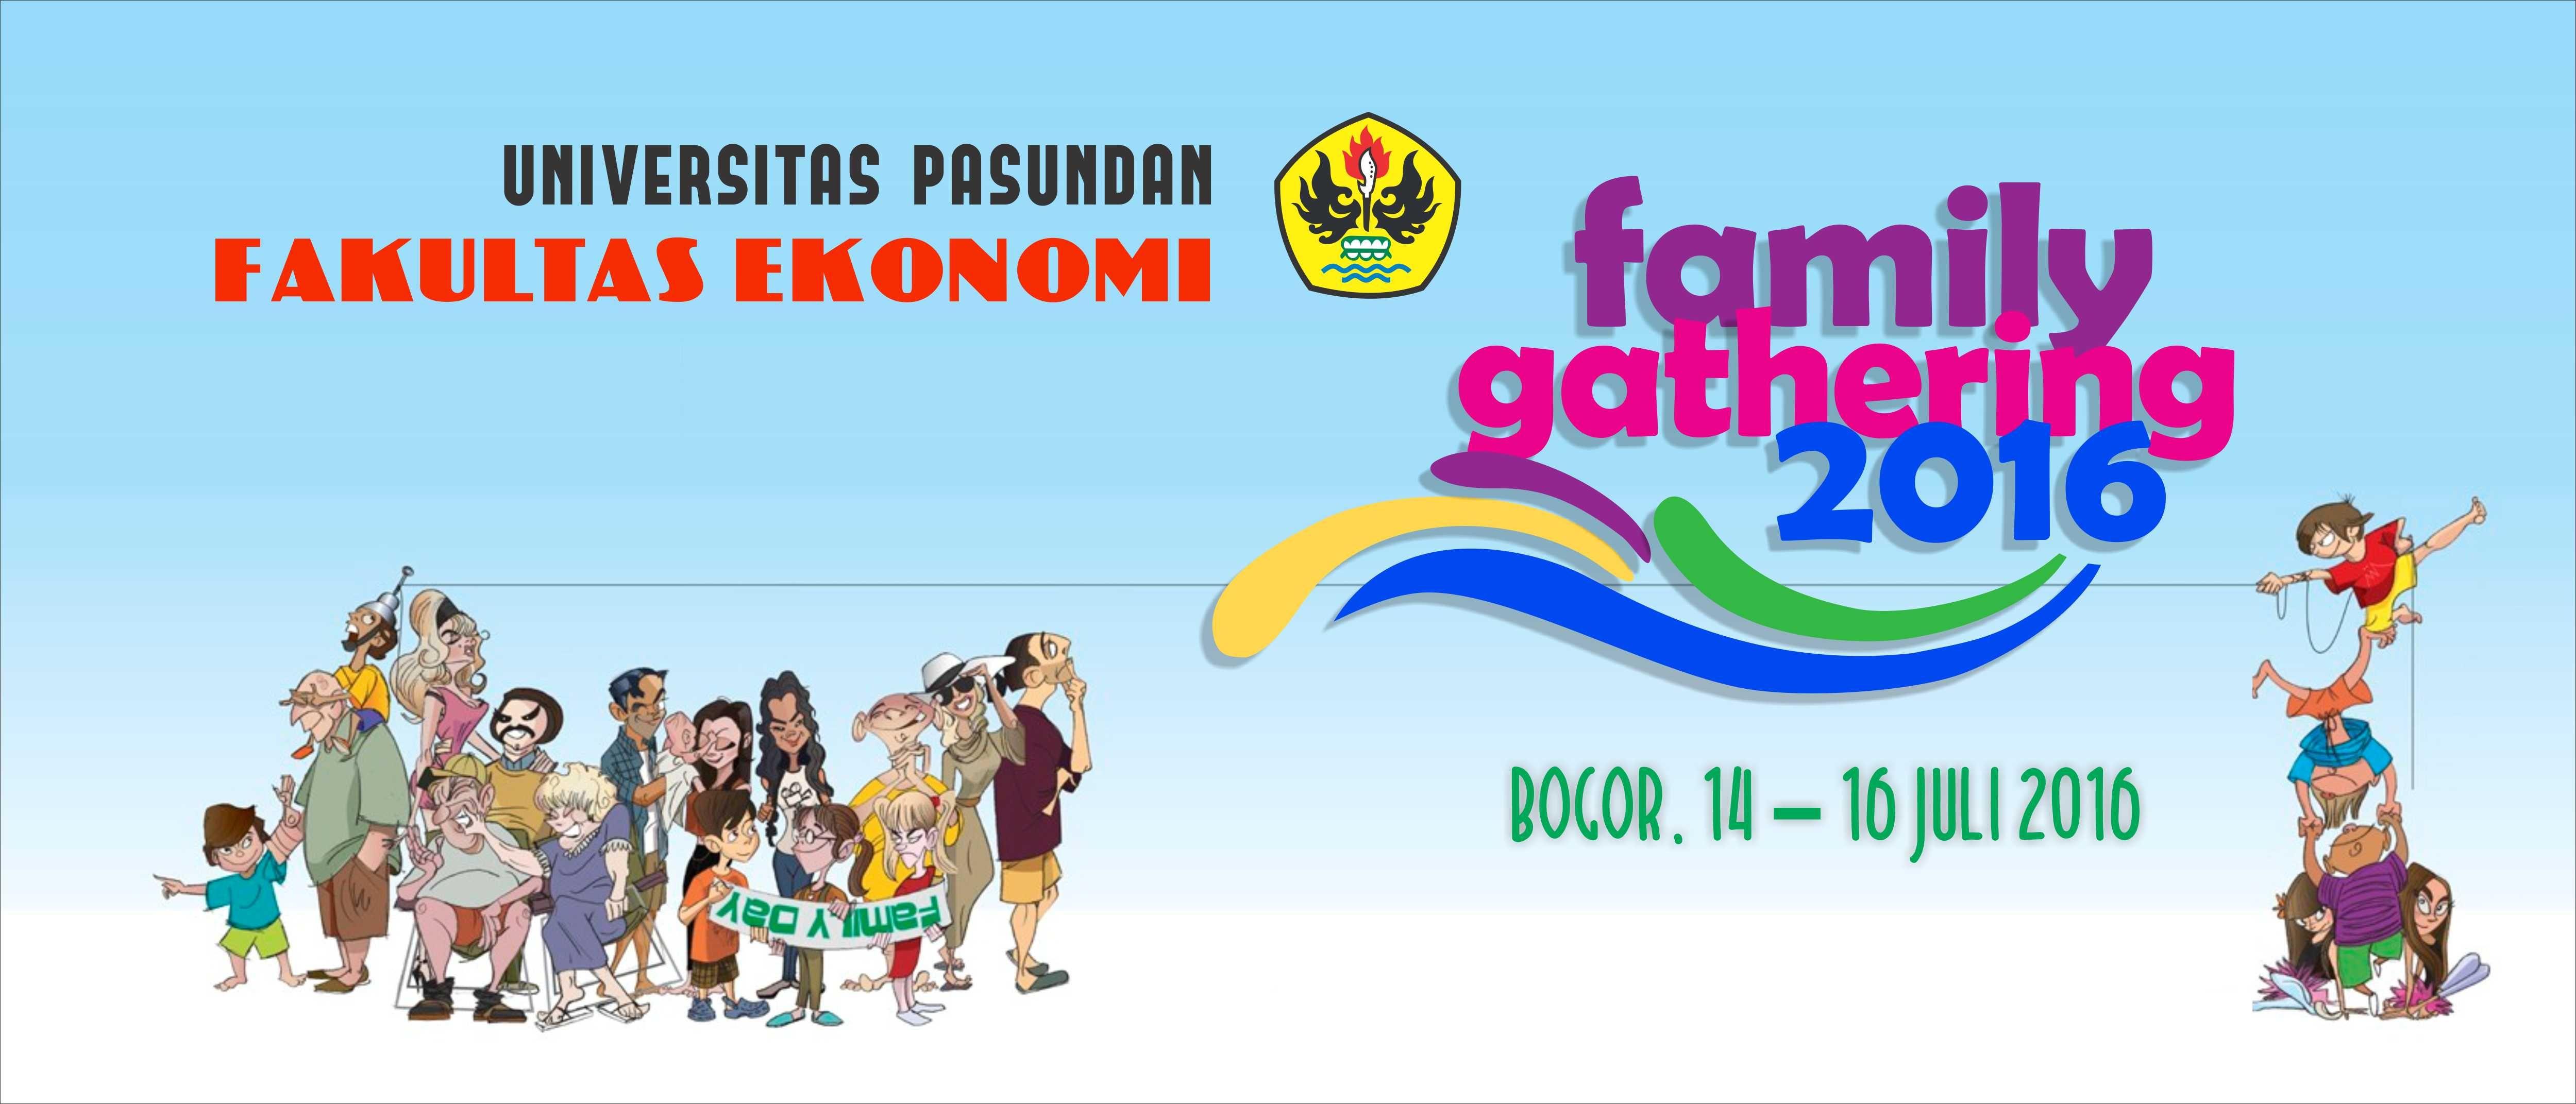 Contoh Spanduk Family Gathering Rt - desain banner kekinian